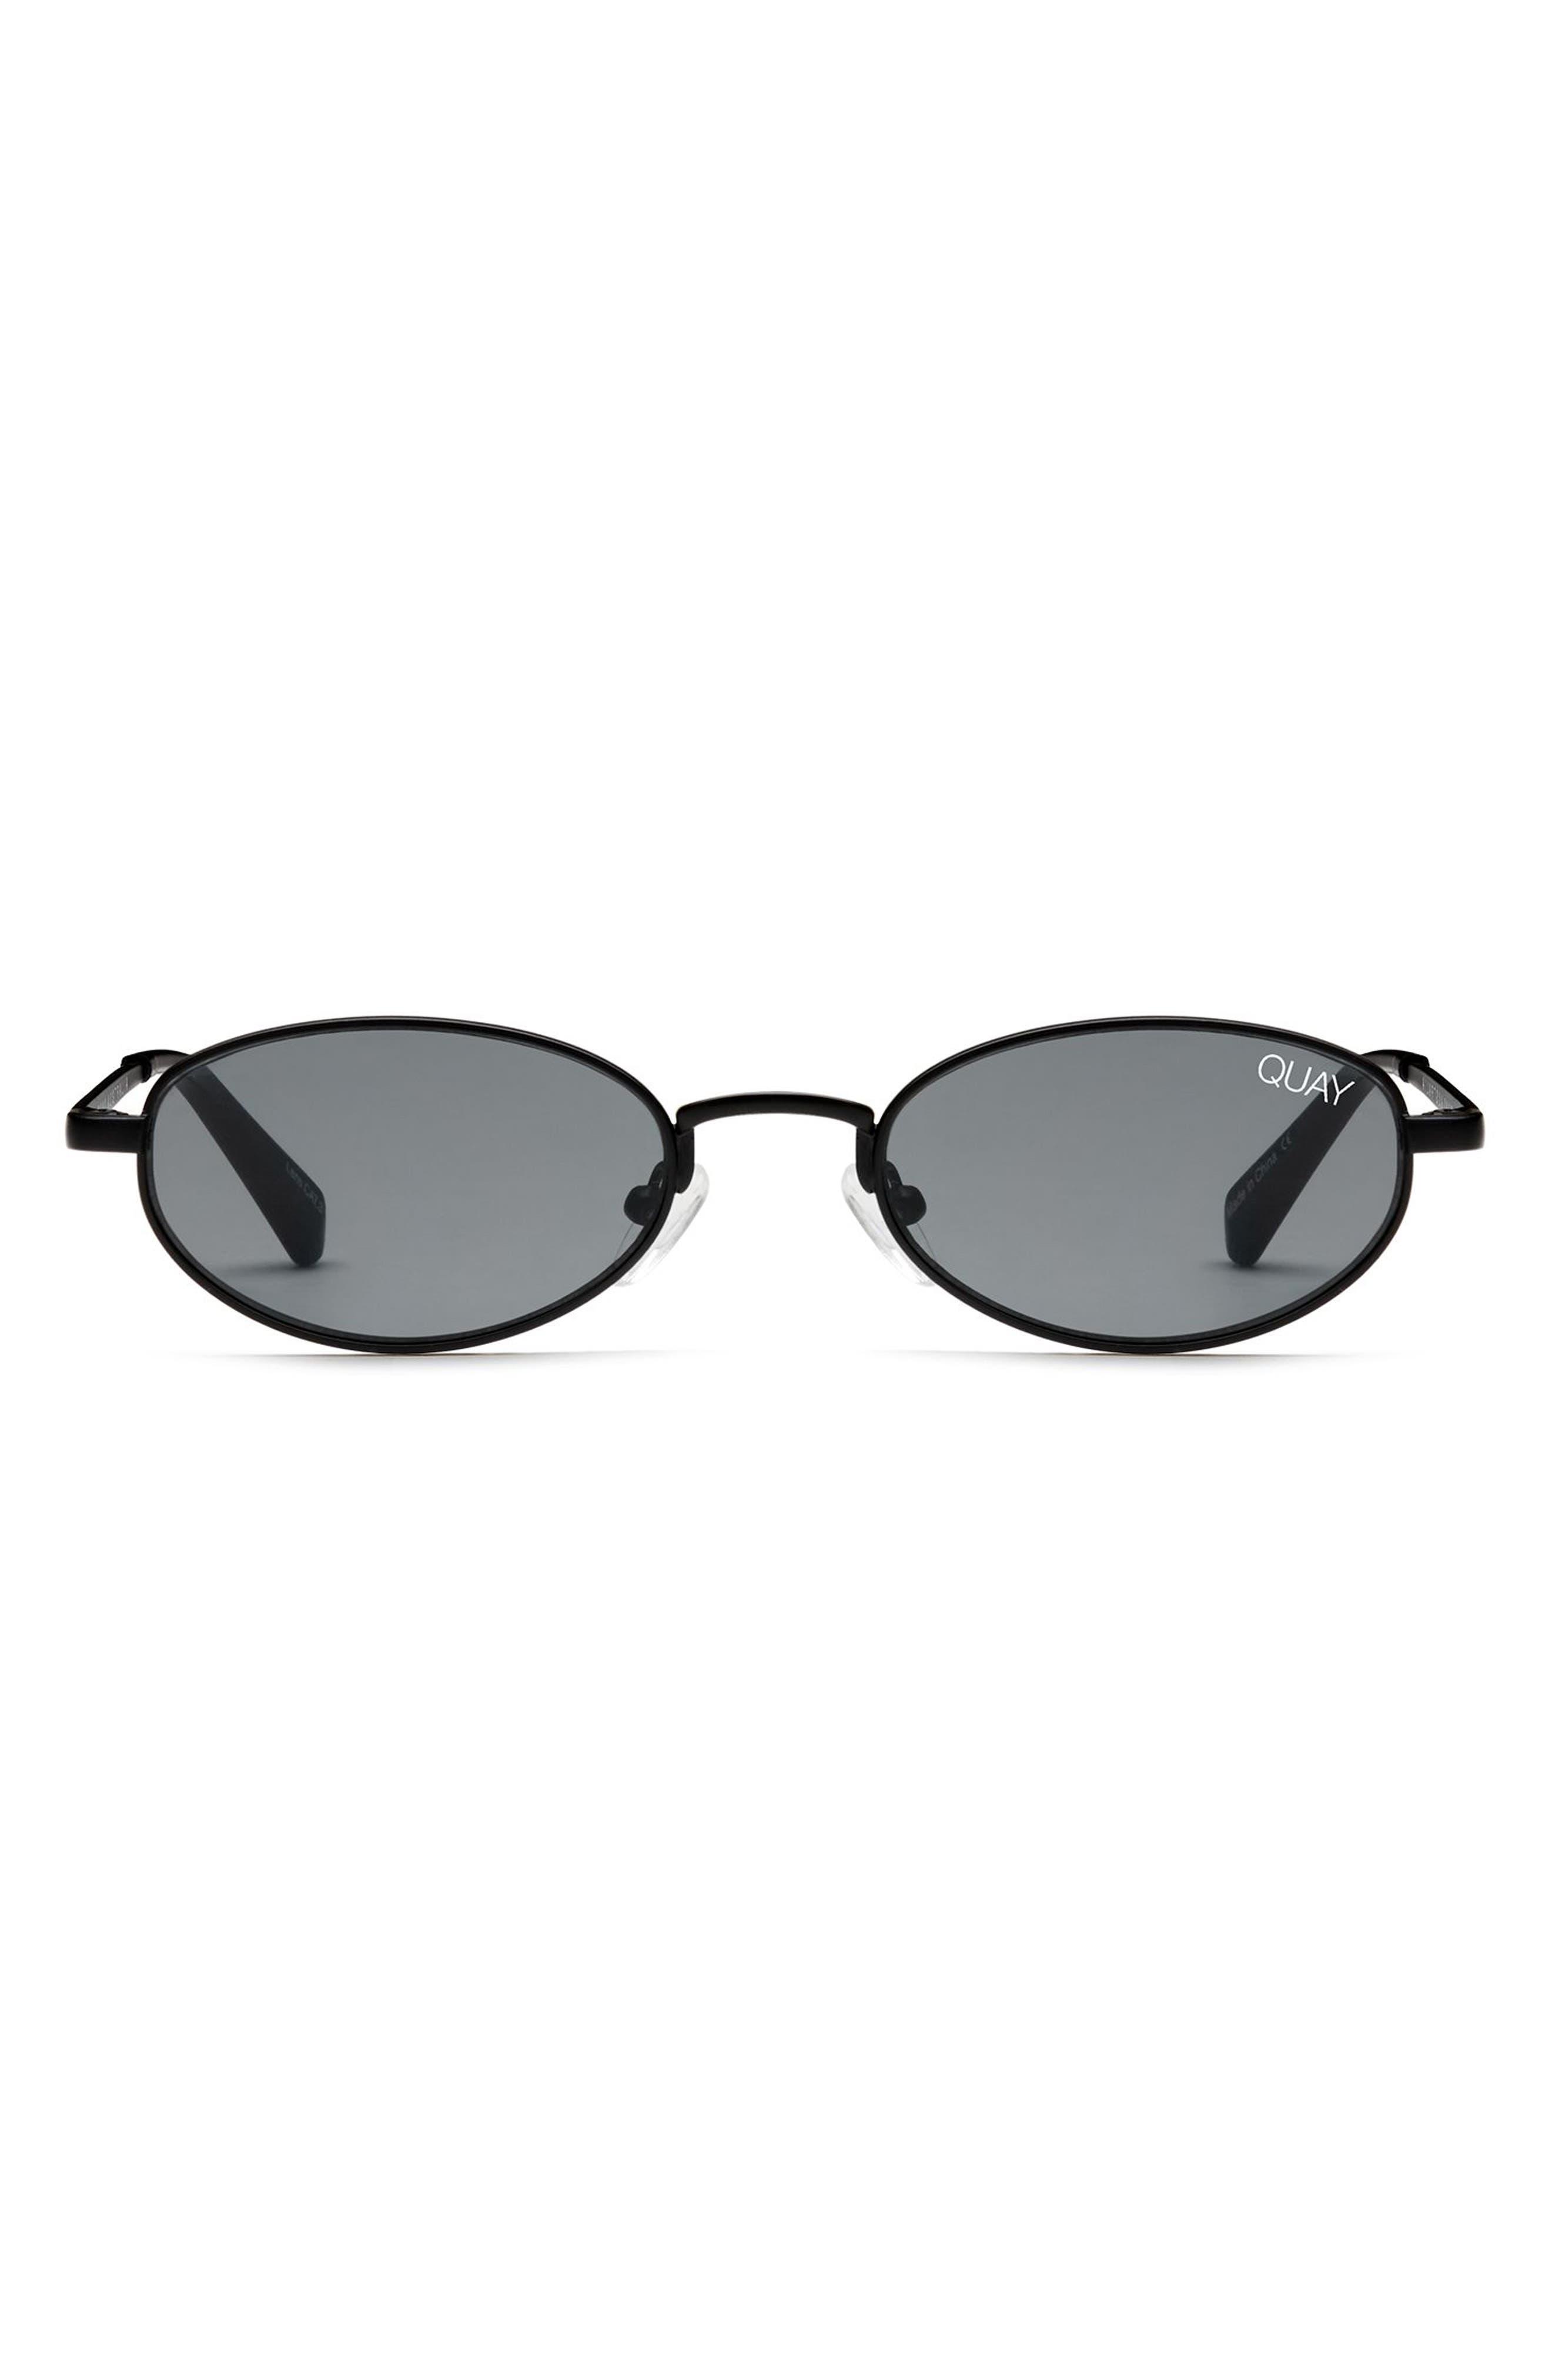 49mm Showdown Oval Sunglasses,                             Alternate thumbnail 5, color,                             BLACK/ SMOKE